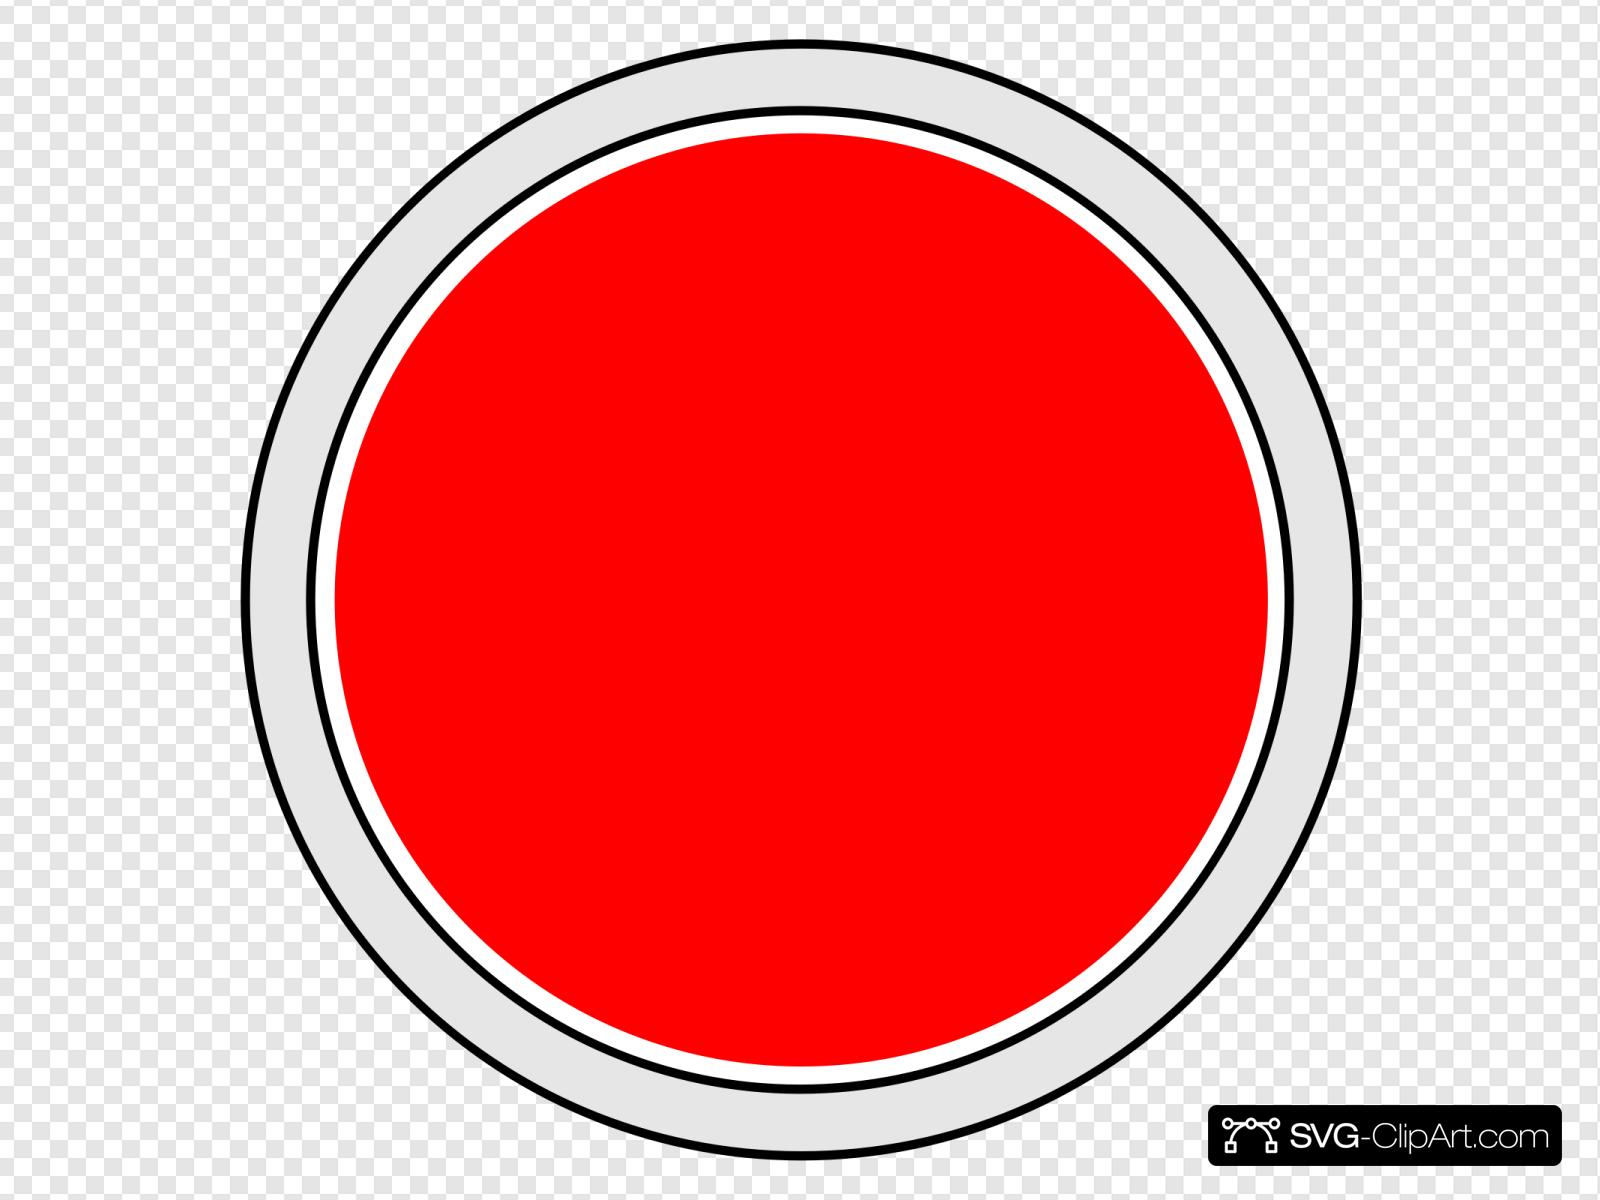 Arcade Button Clip art, Icon and SVG.